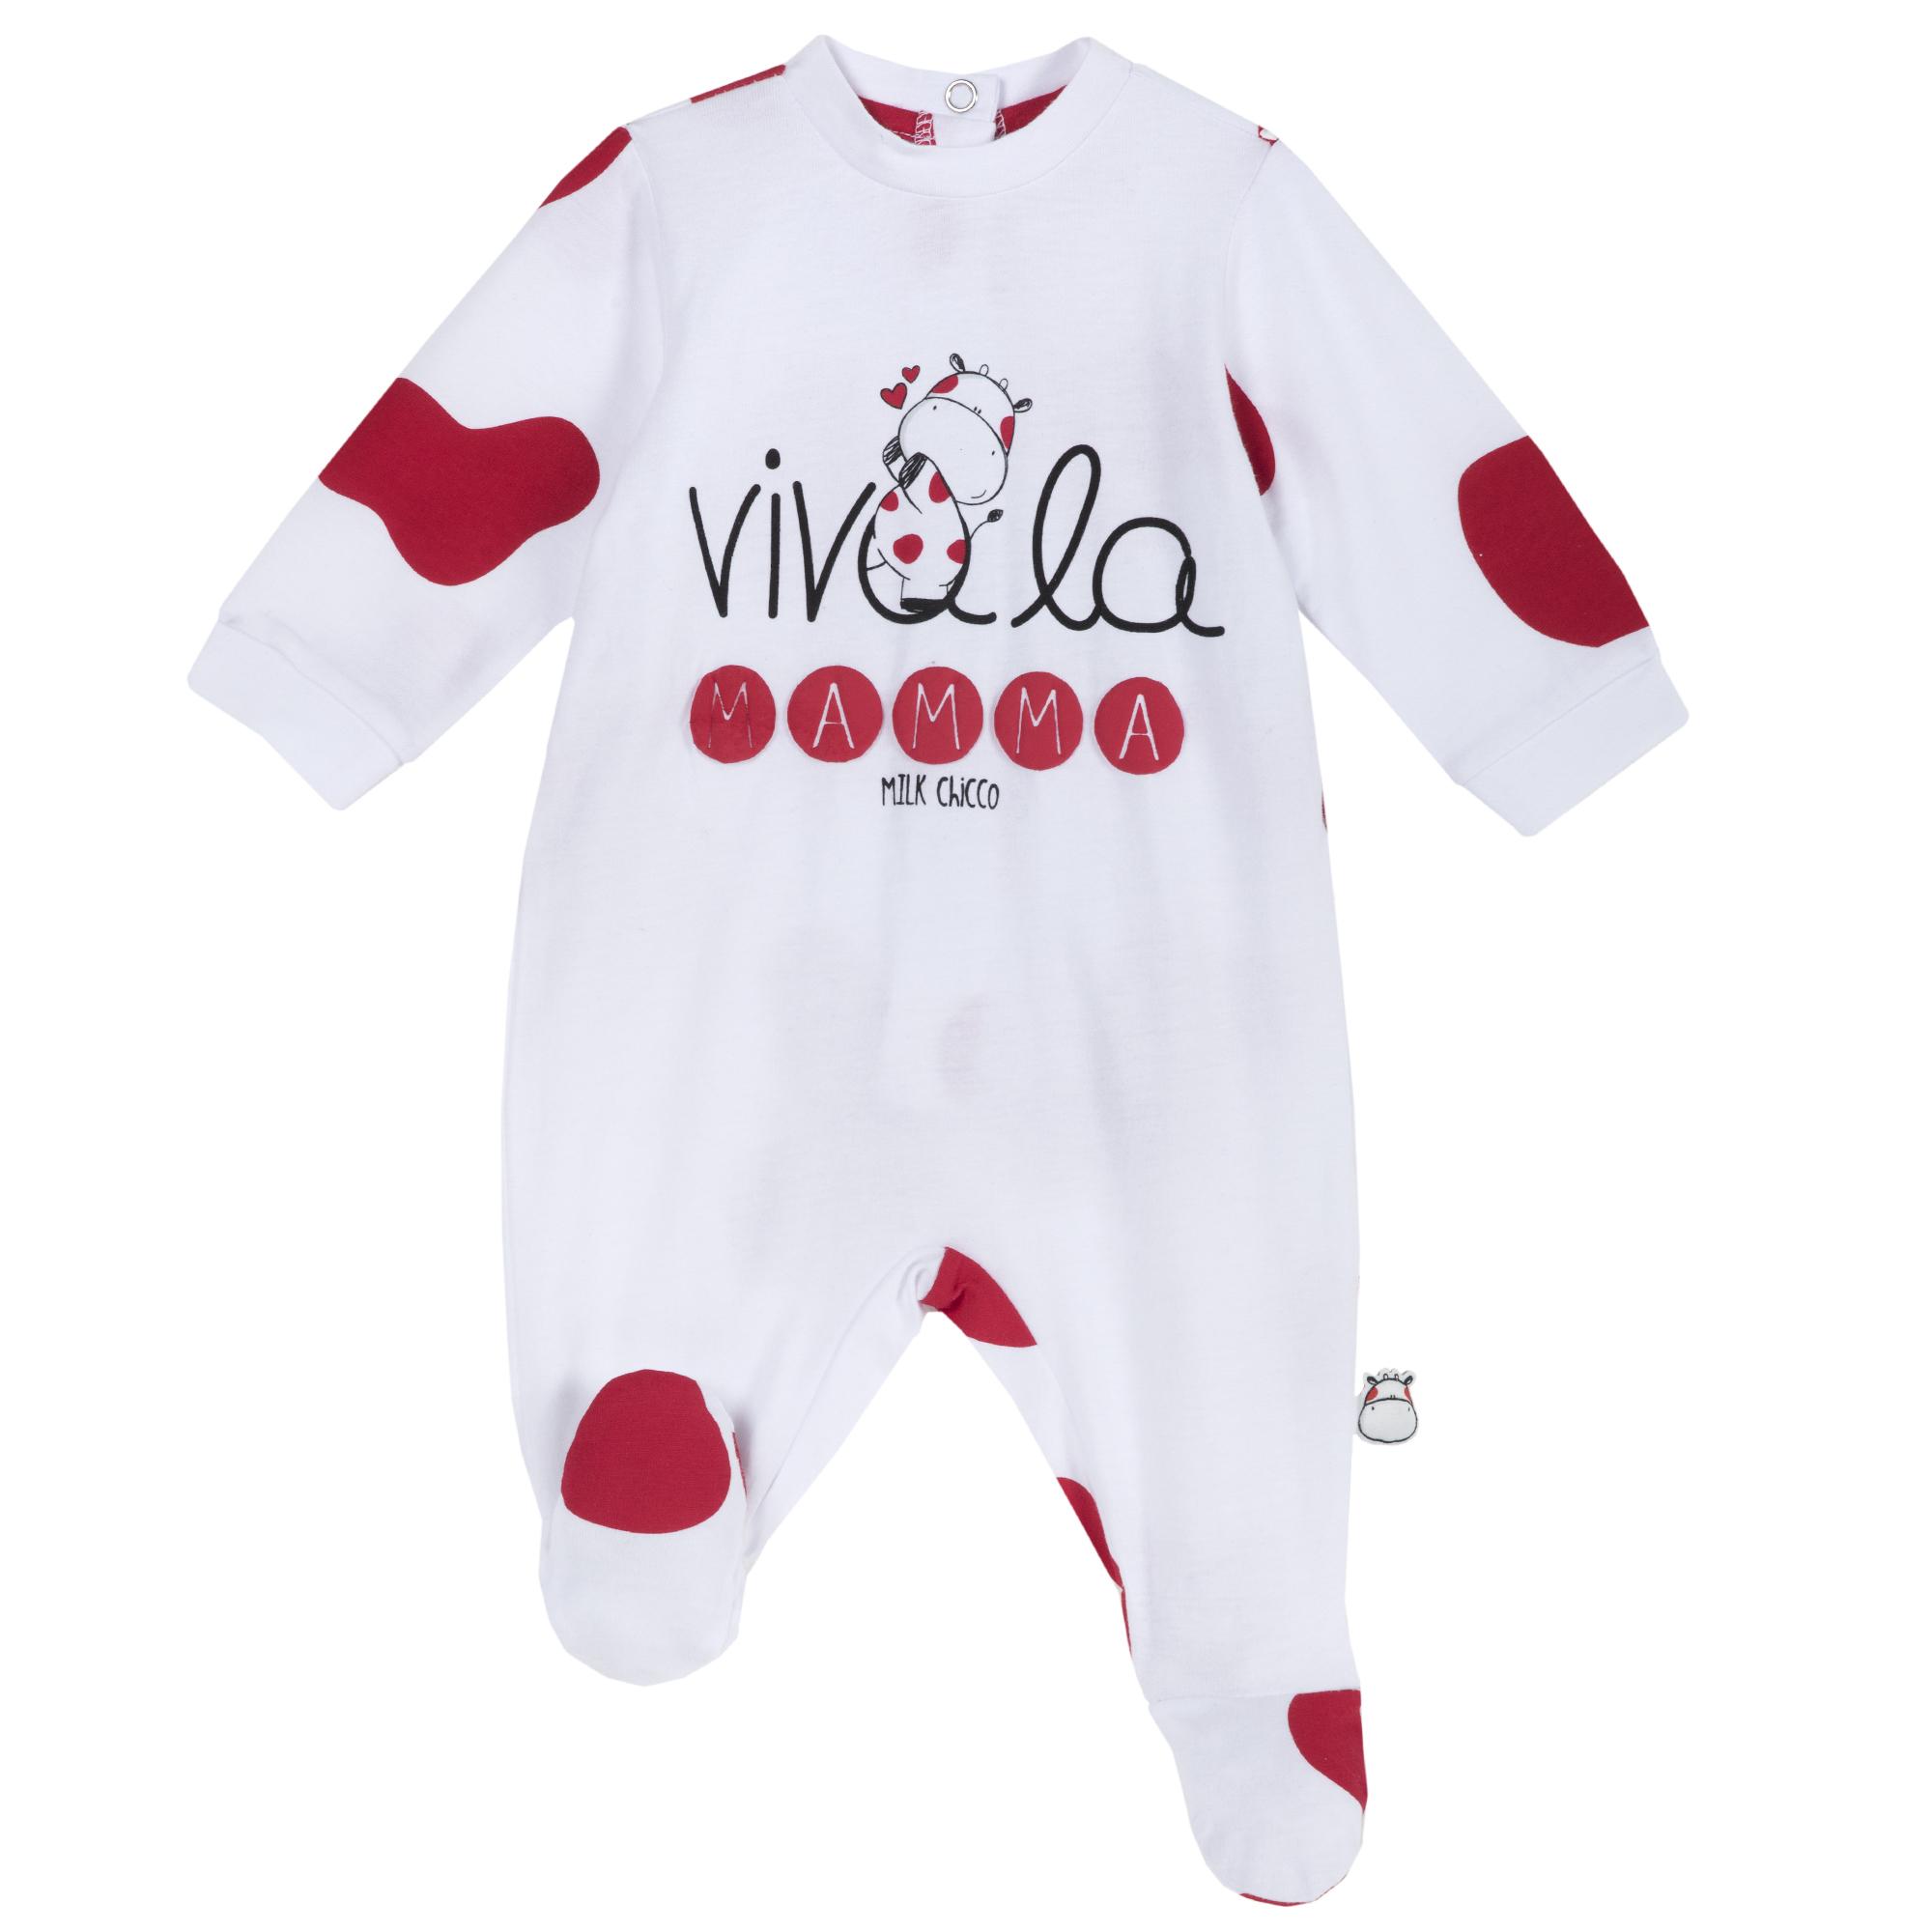 Salopeta bebelusi Chicco, maneca lunga, alb cu rosu, 21744 din categoria Salopete/Body